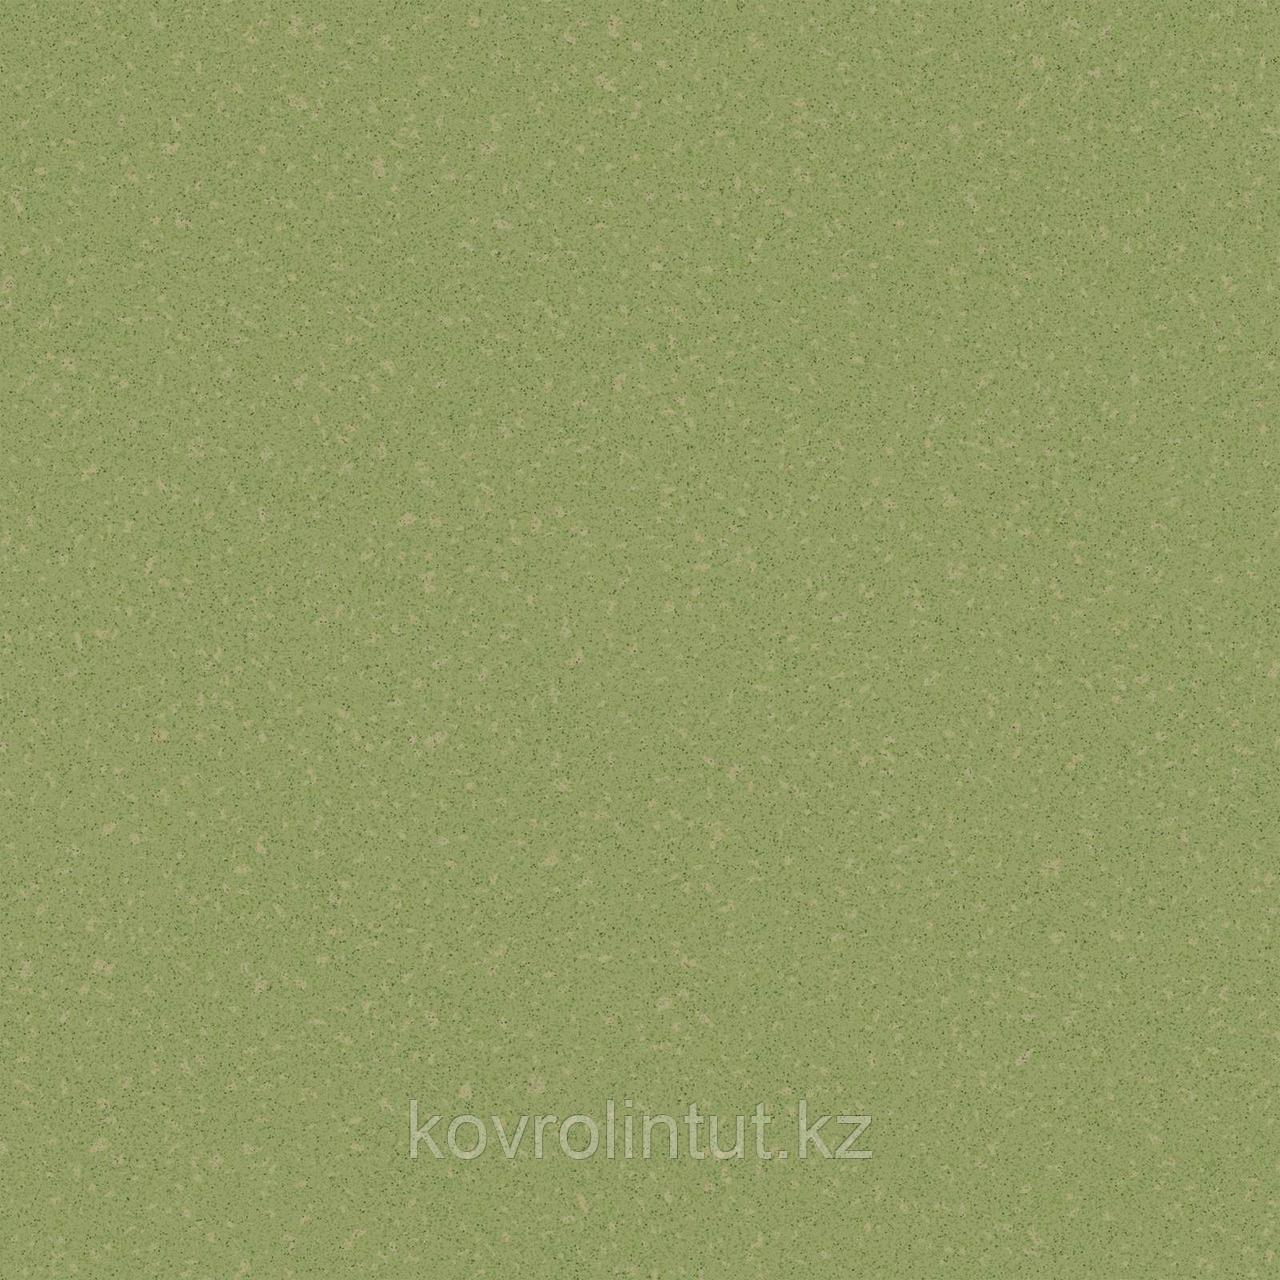 Линолеум Tarkett коммерческий Acczent Pro Aspect 9 3 м